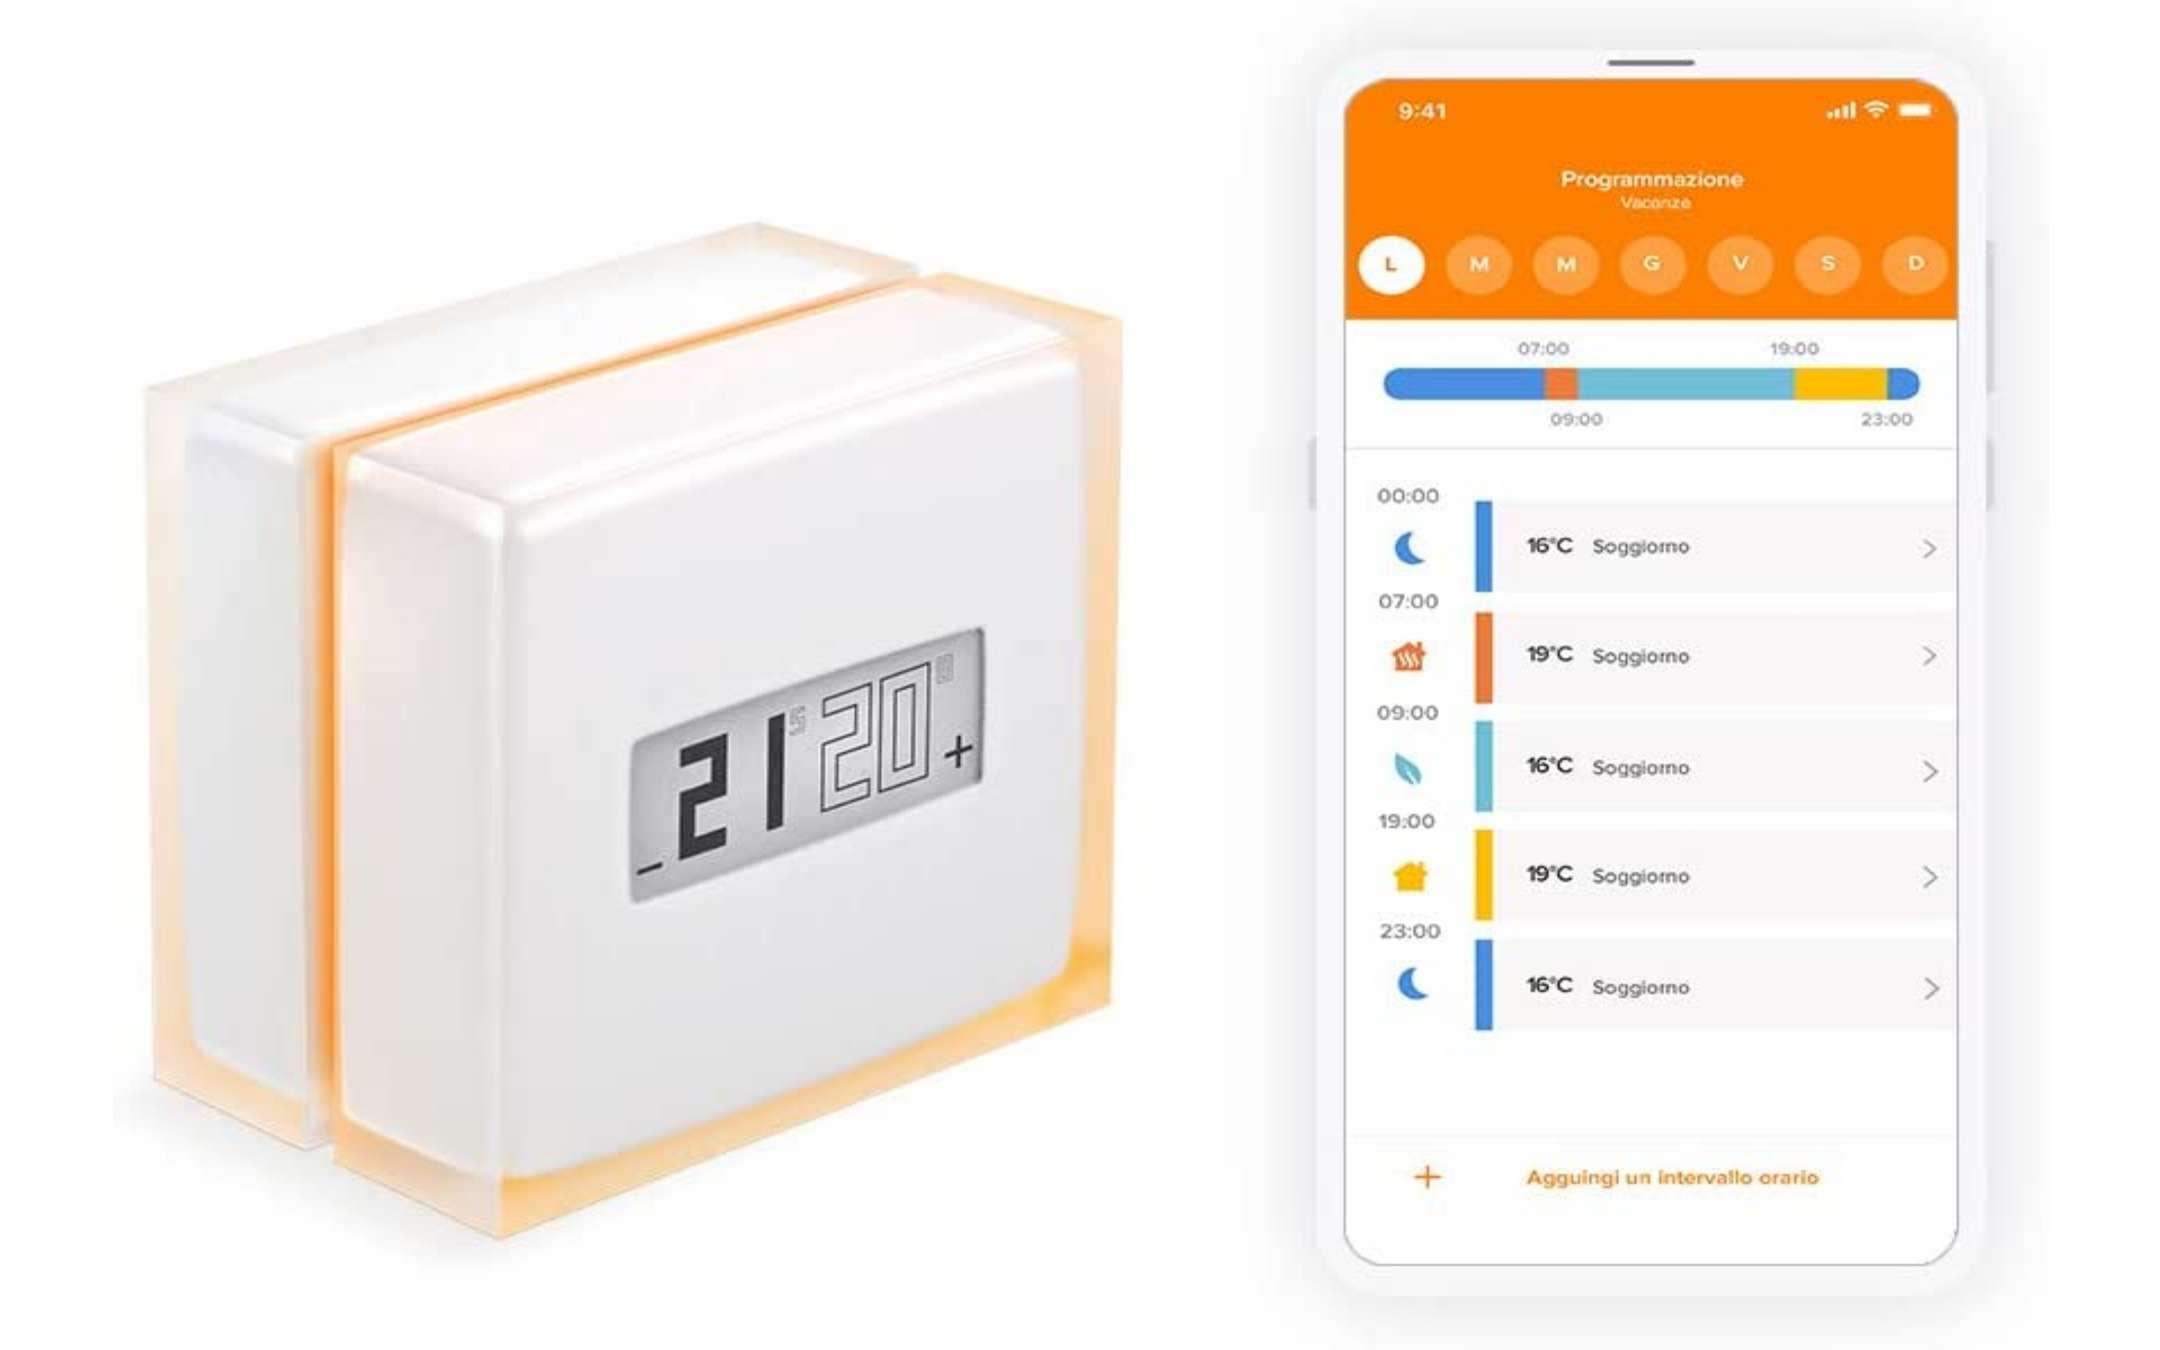 Netatmo thermostat: up to 110 € of Amazon vouchers